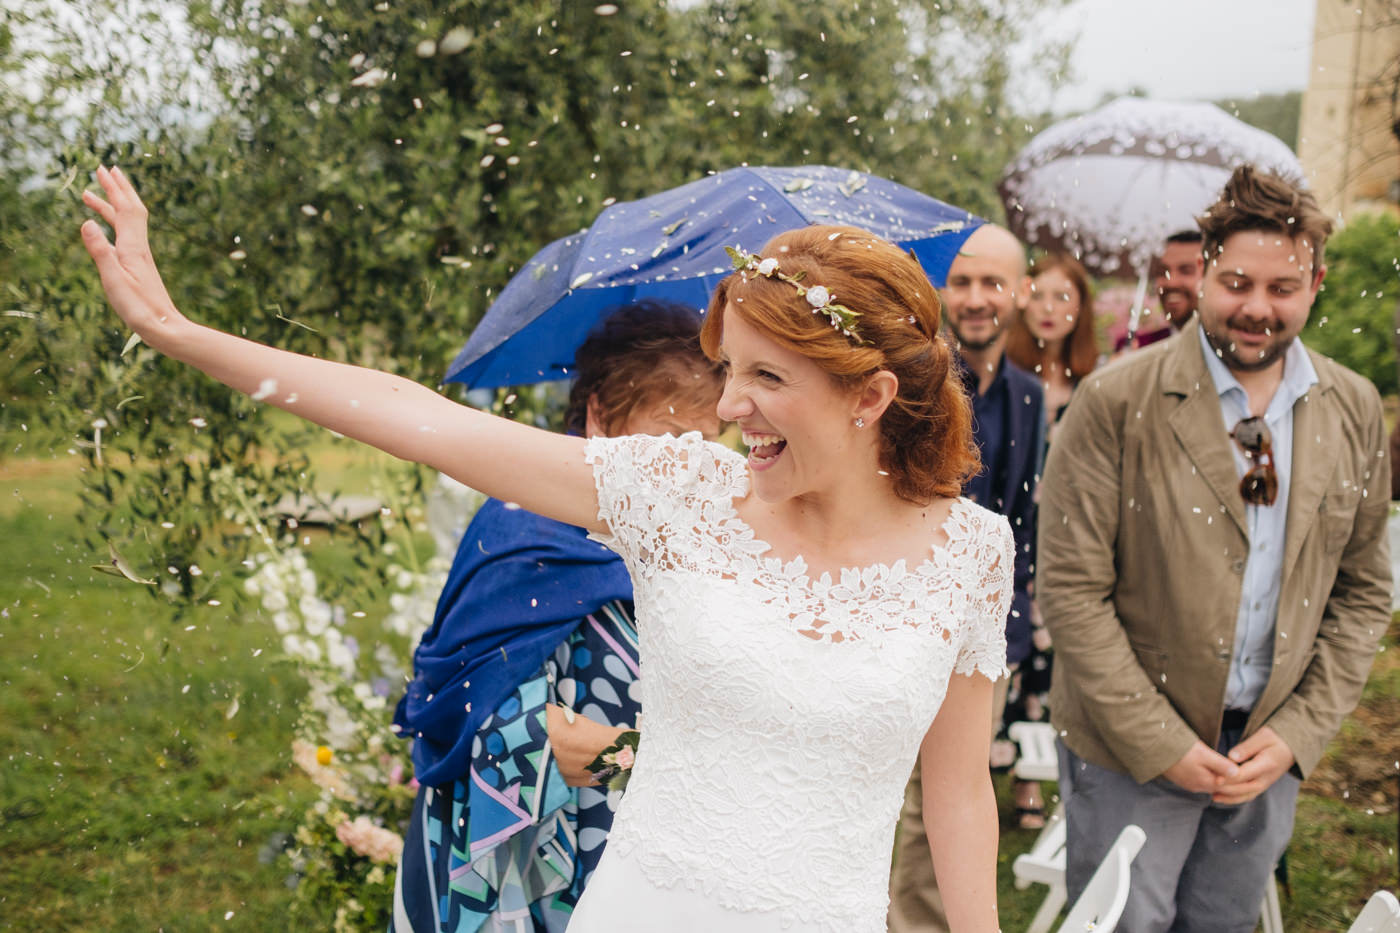 matrimoni_all_italiana_fotografo_matrimonio_toscana-45.jpg